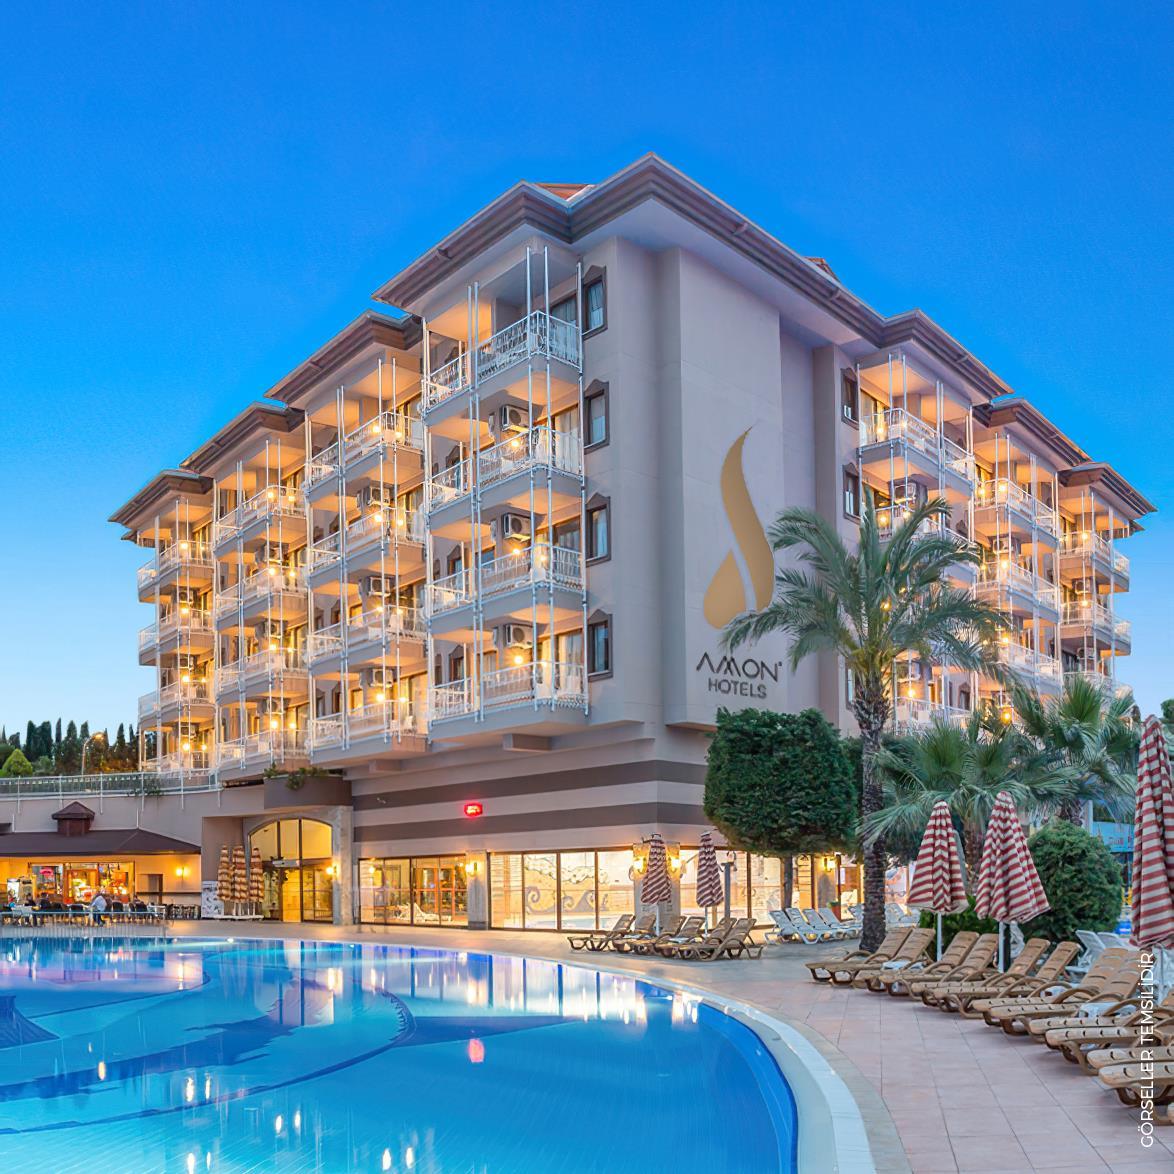 http://www.orextravel.sk/OREX/hotelphotos/amon-hotels-area-0027.jpg